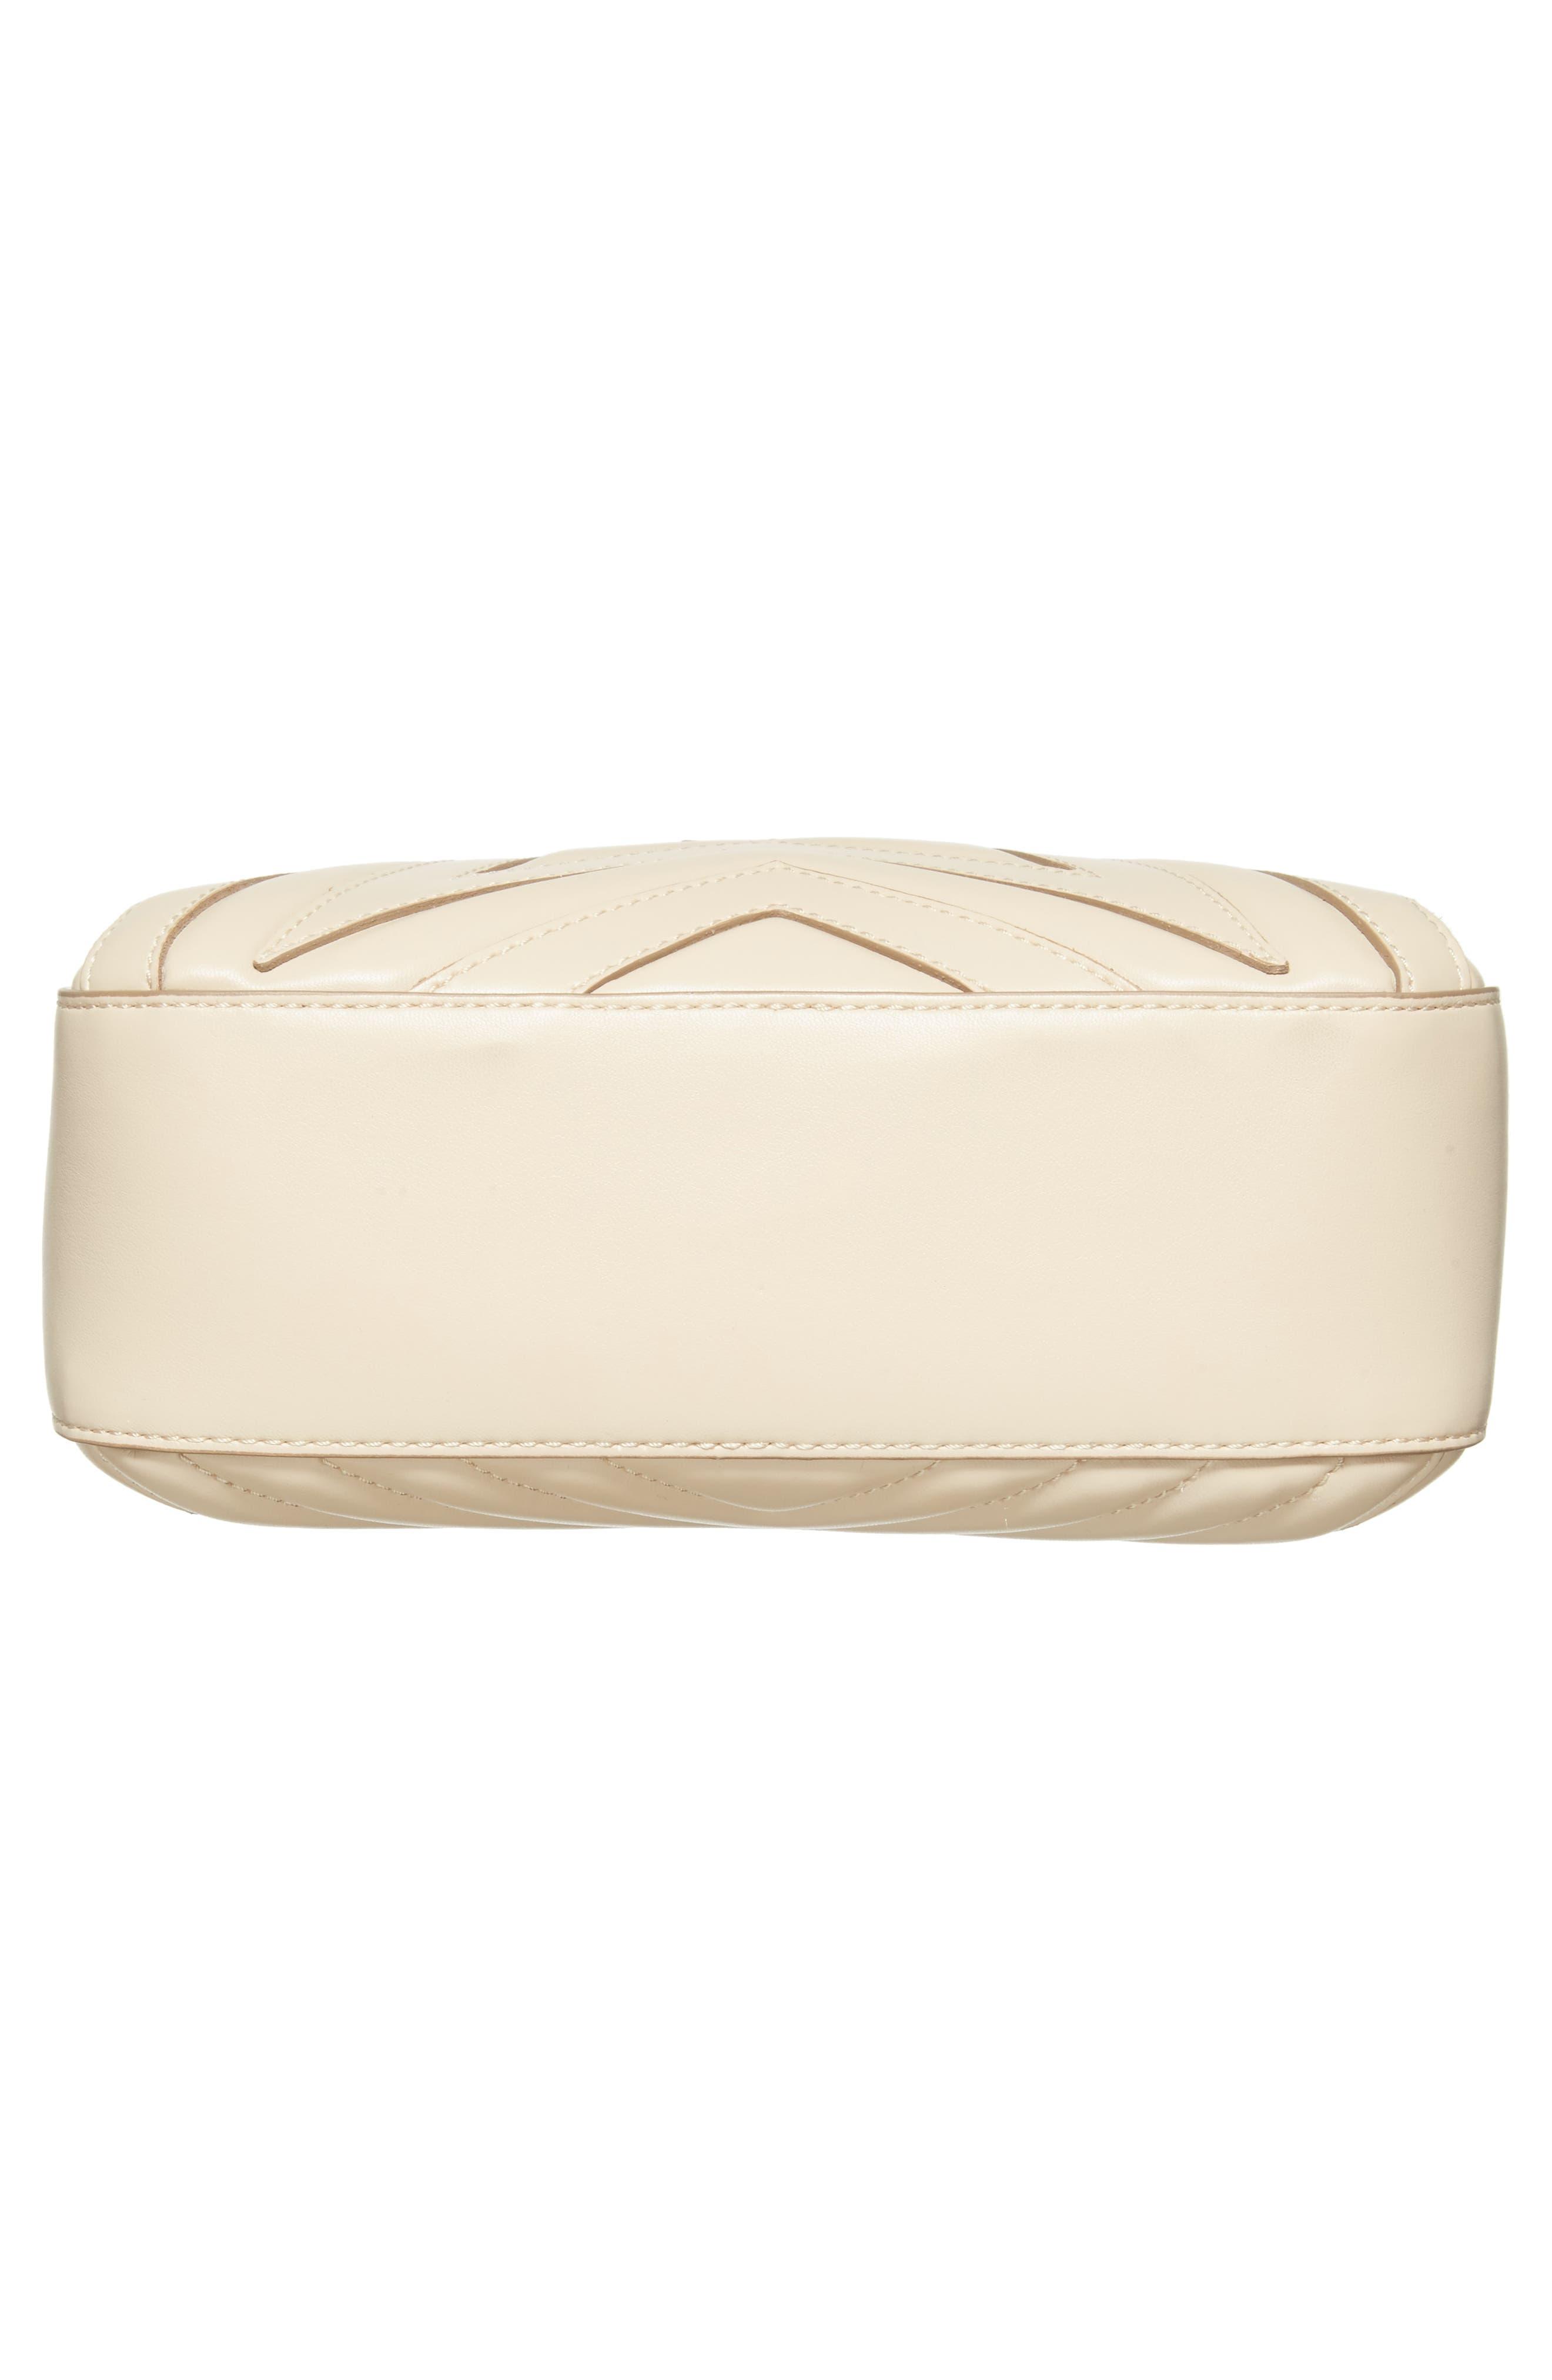 Alter Nappa Faux Leather Shoulder Bag,                             Alternate thumbnail 5, color,                             Cream